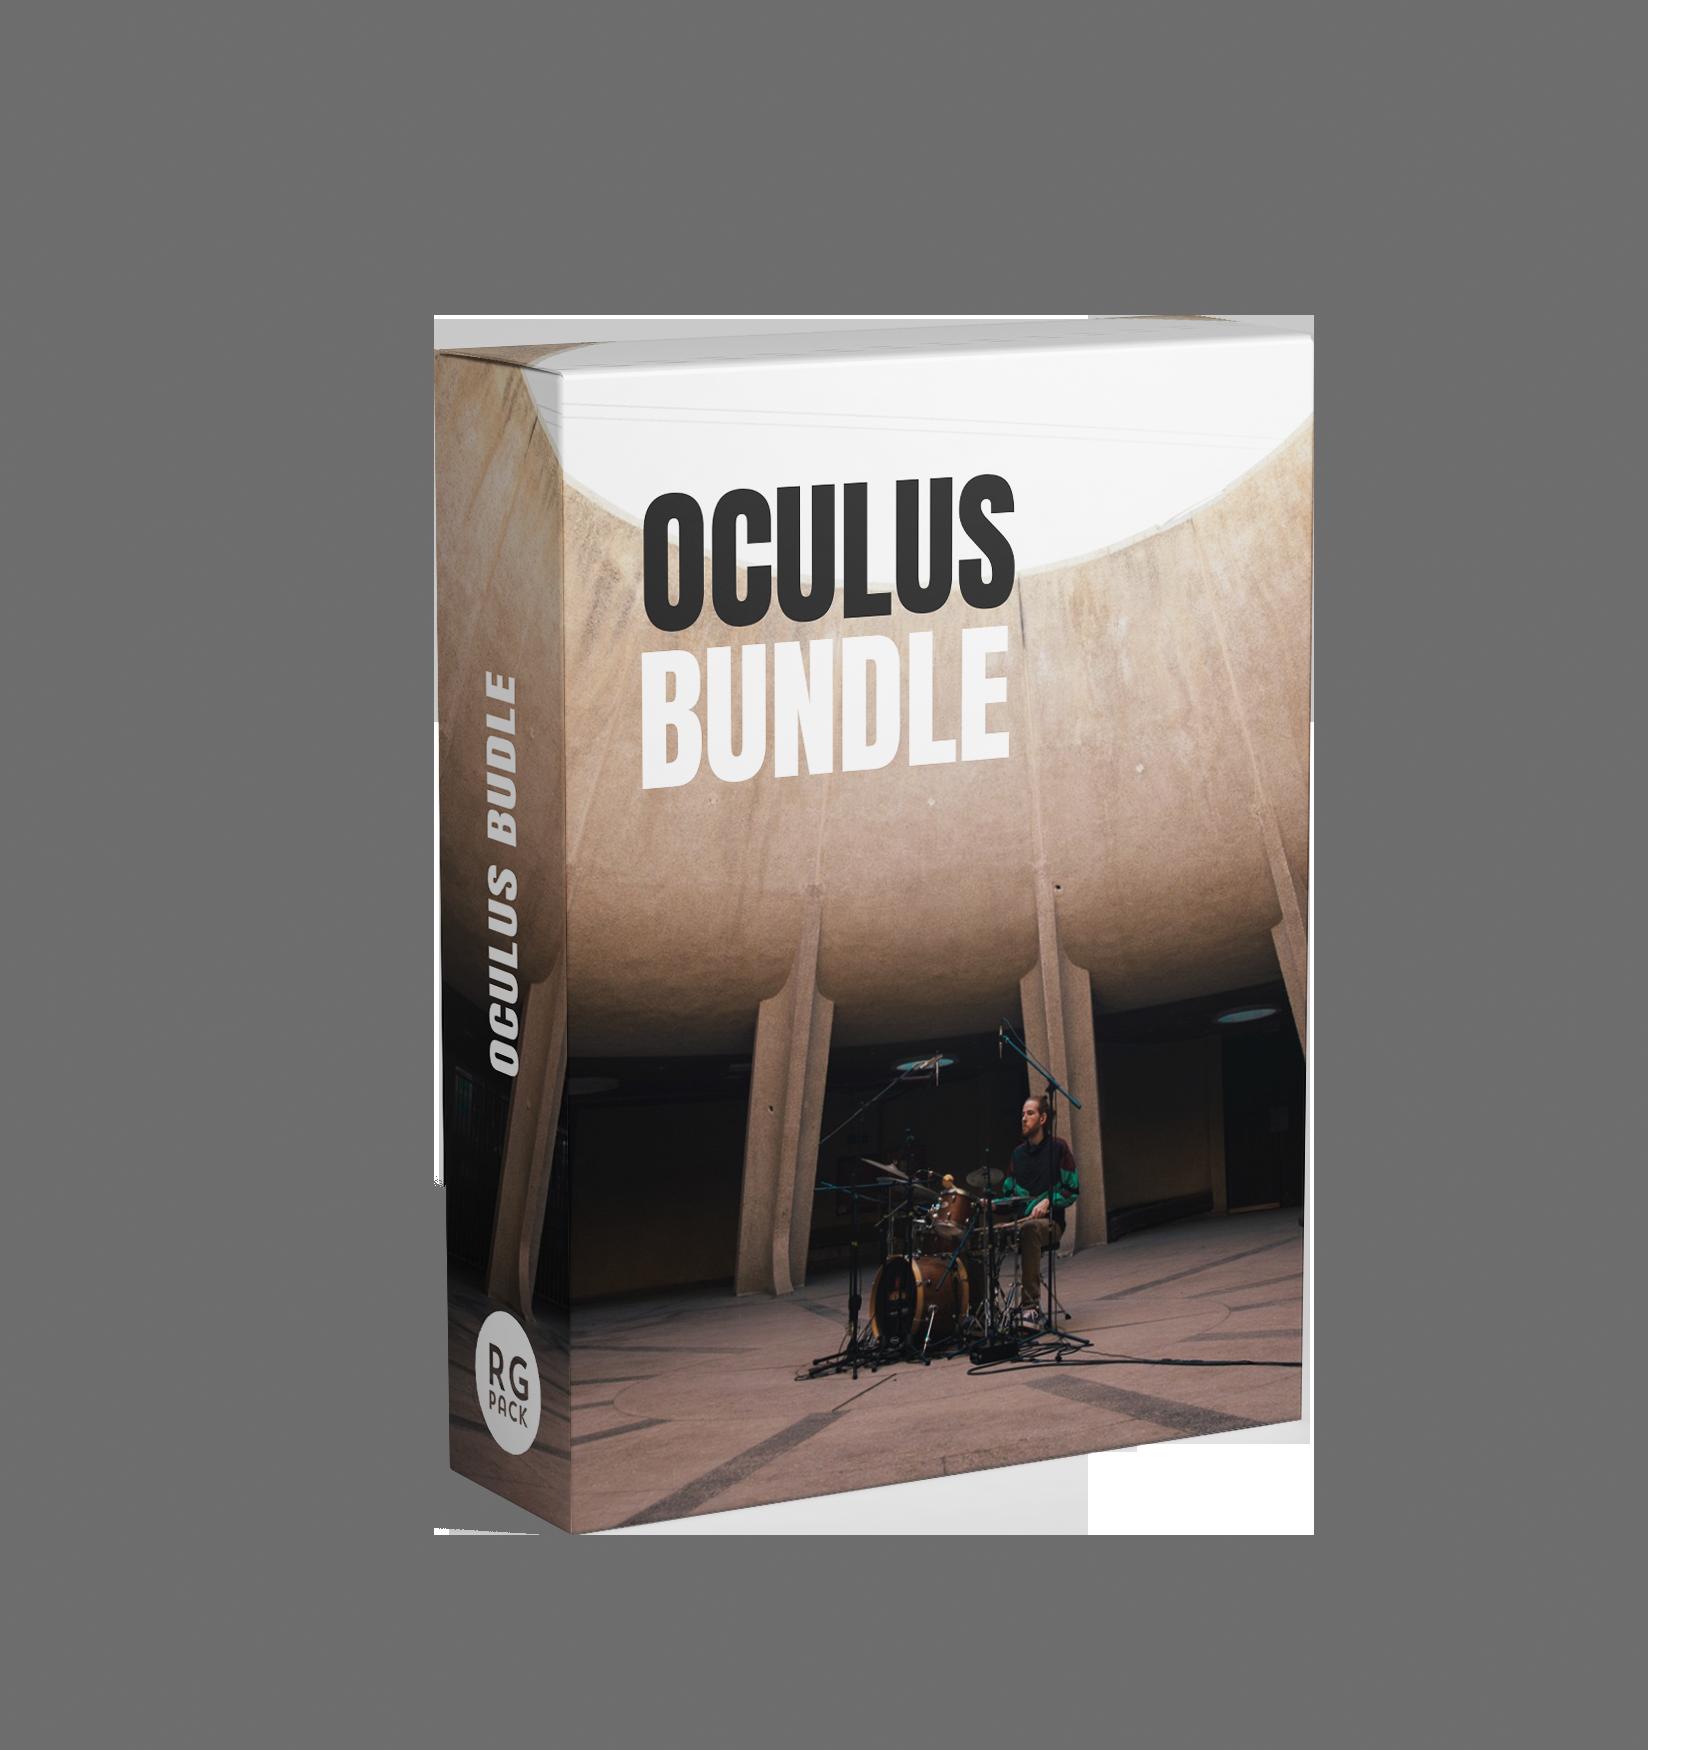 Oculus Bundle